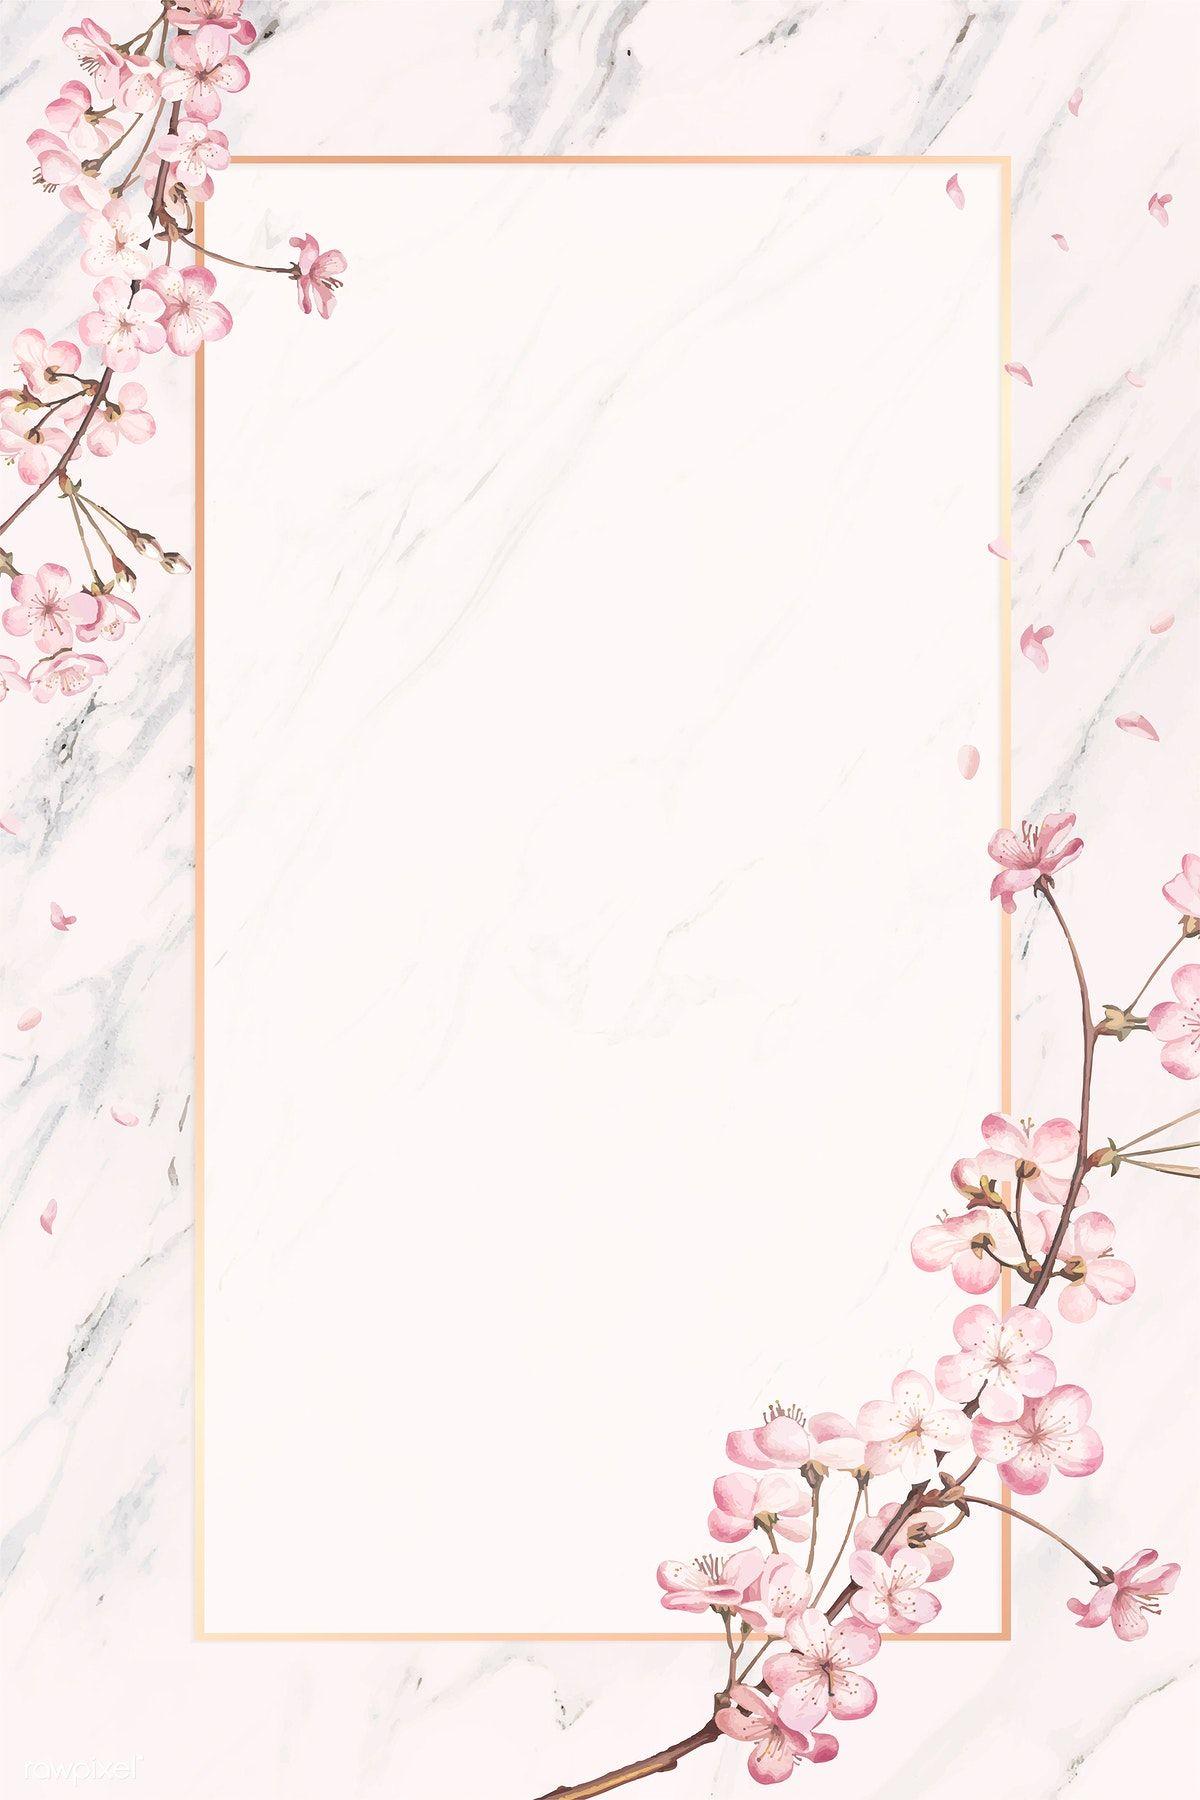 Download premium vector of Pink floral frame card vector